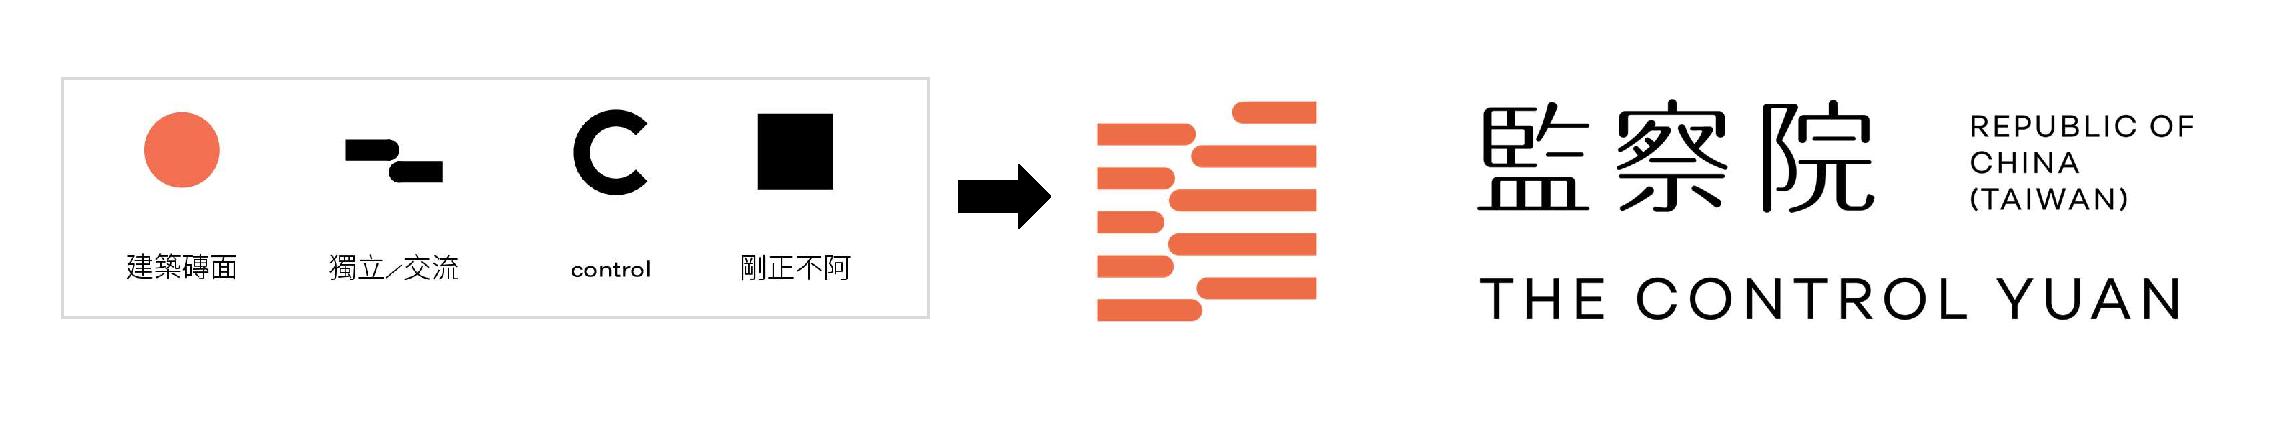 logo組成說明圖